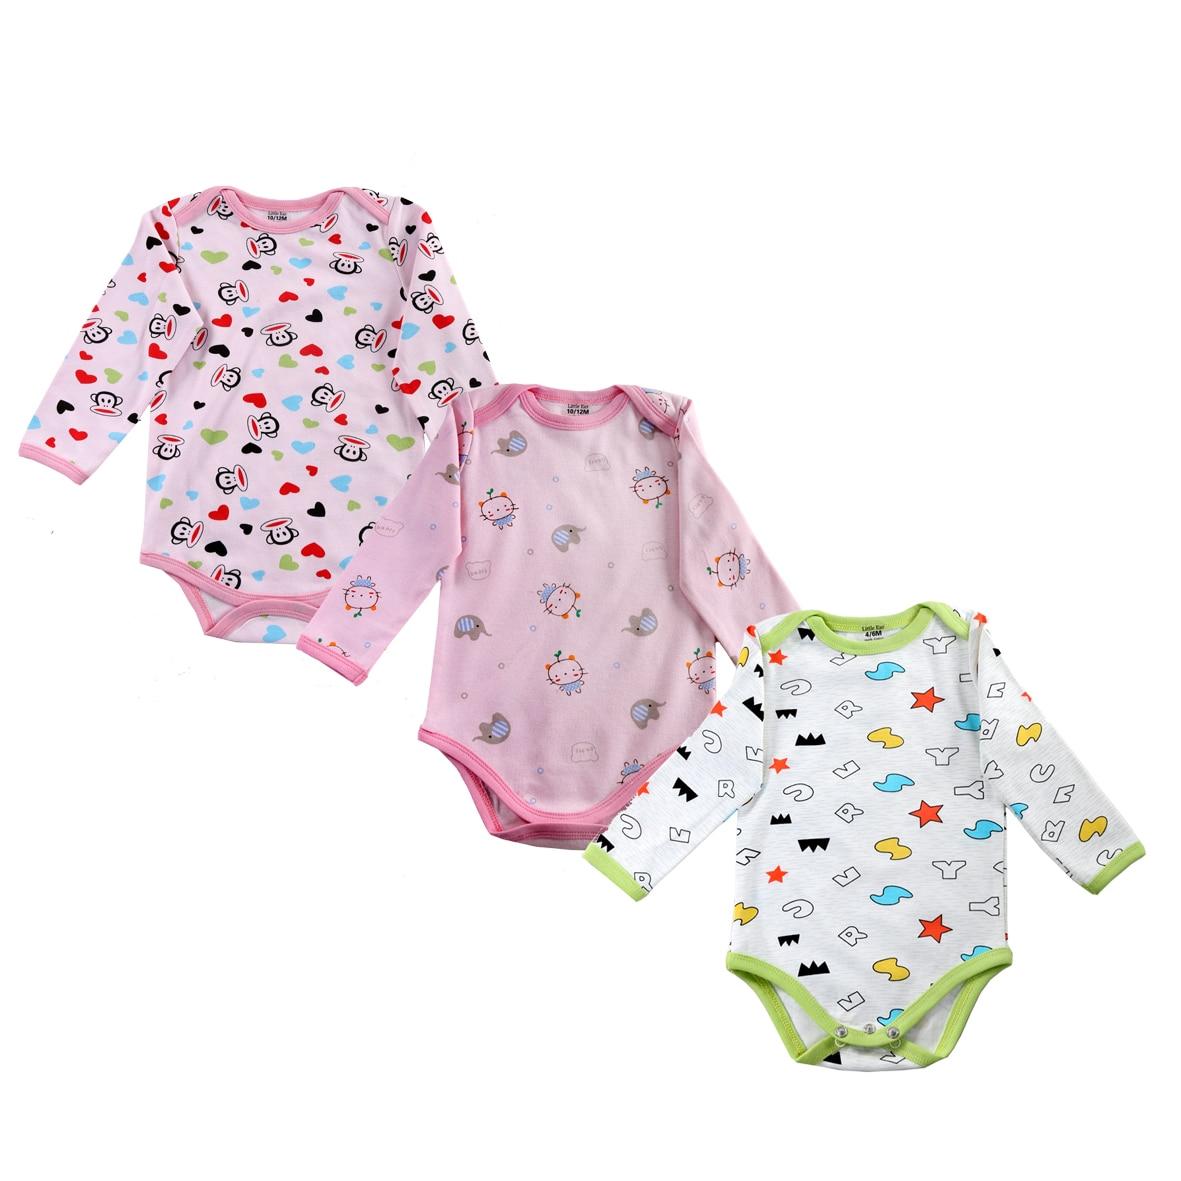 Fashion newborn baby girl clothes 94